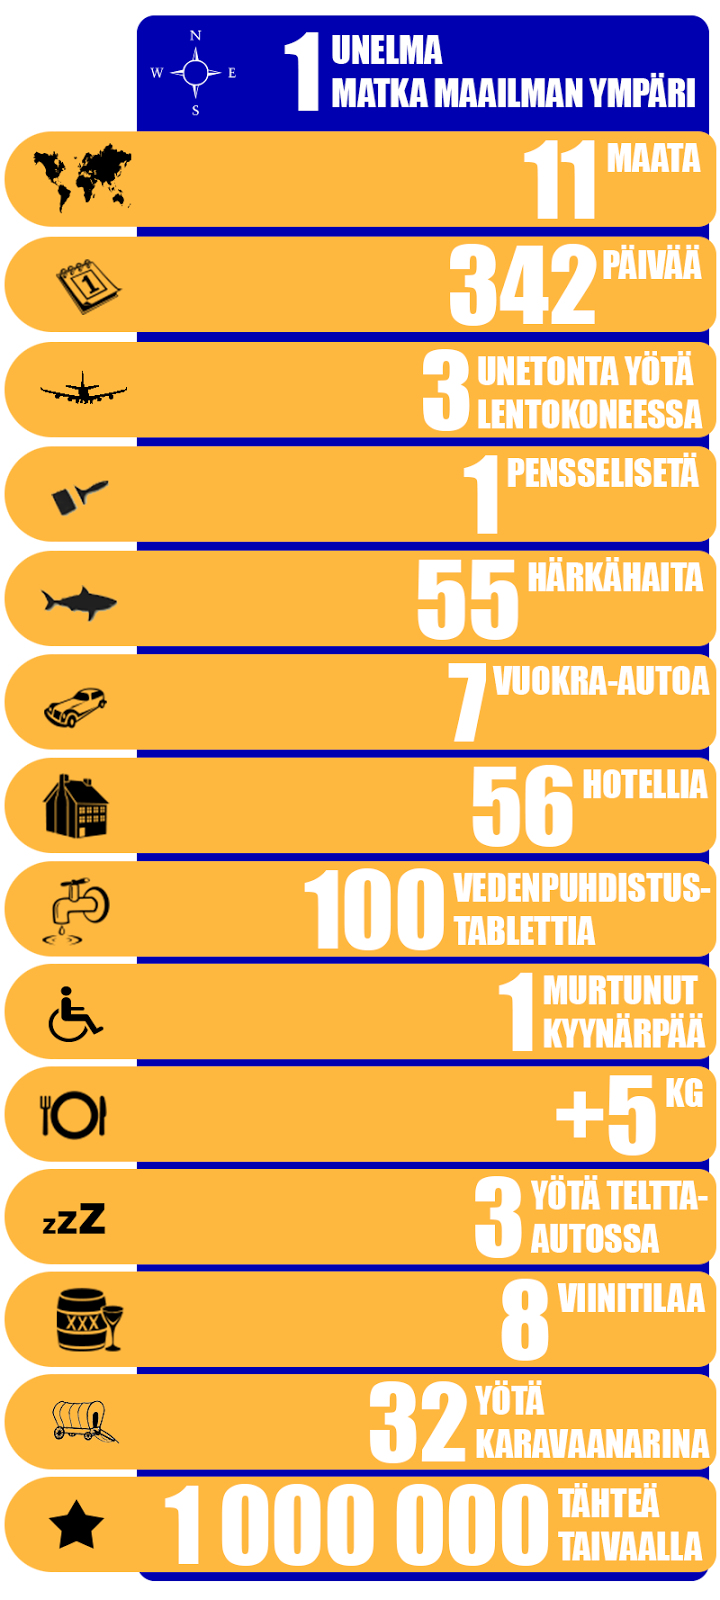 matkakuume.net: 2016